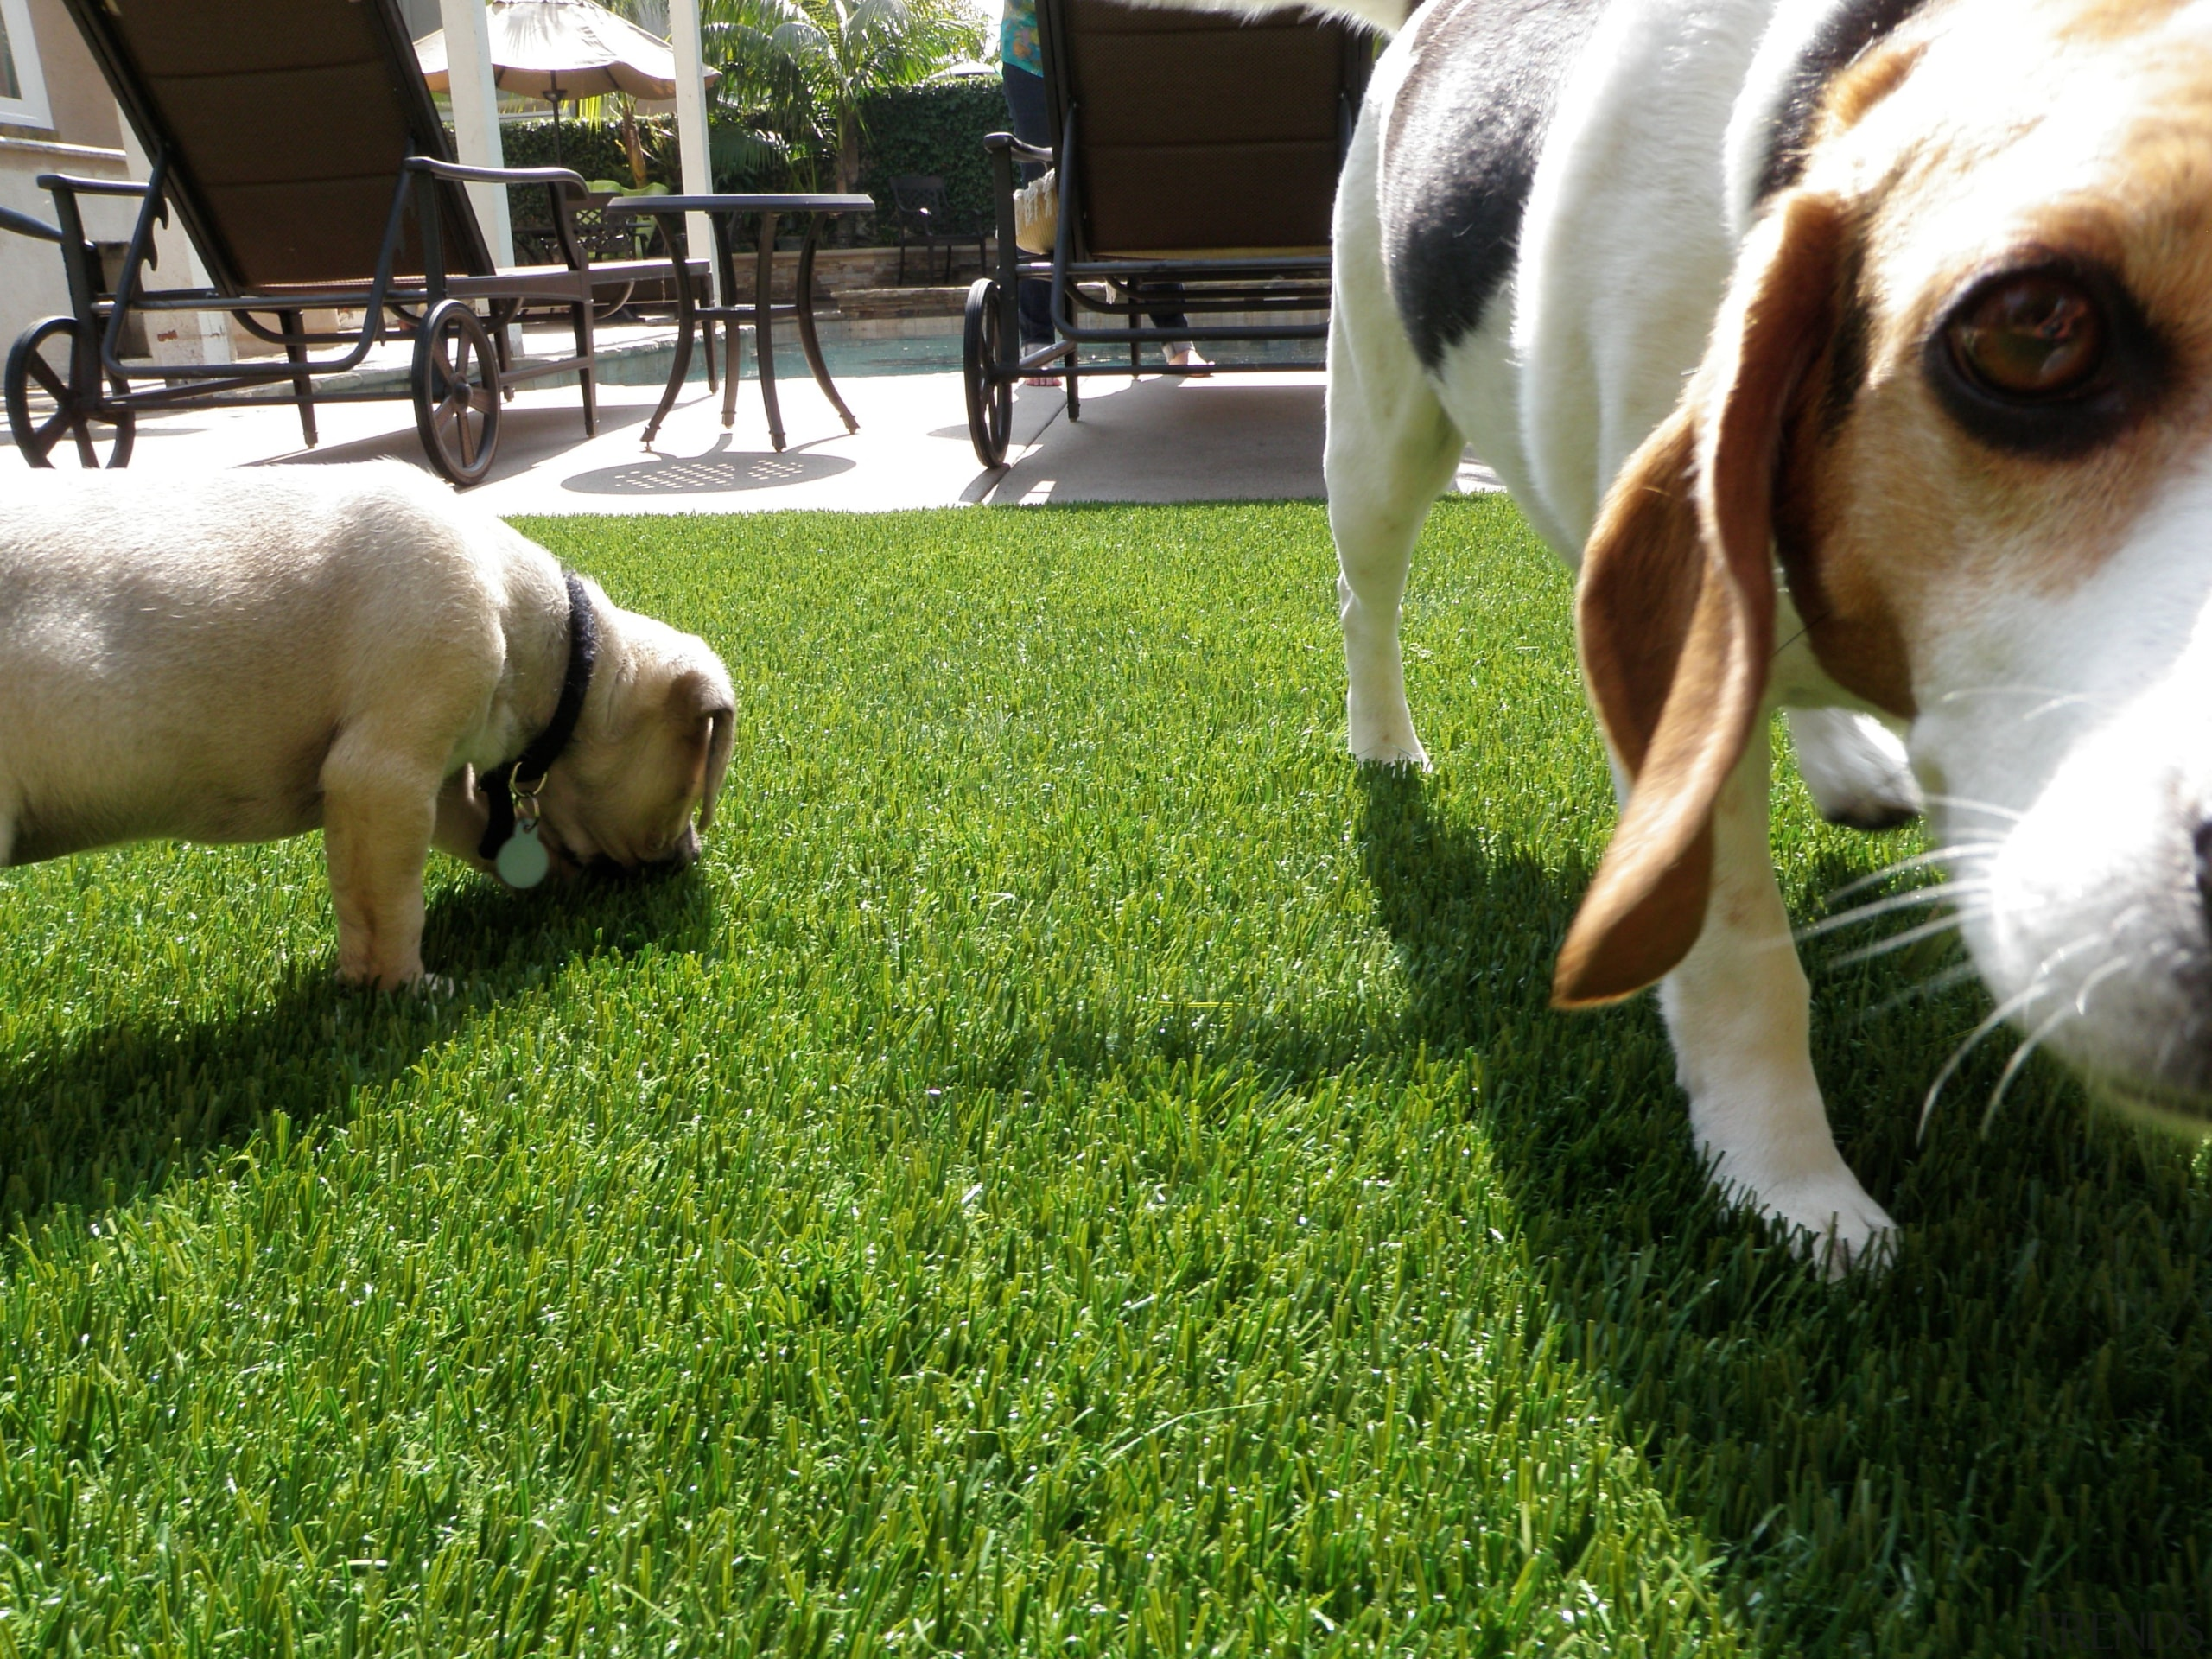 Residential landscape - Residential landscape - beagle | beagle, dog, dog breed, dog breed group, dog like mammal, grass, hound, lawn, plant, snout, green